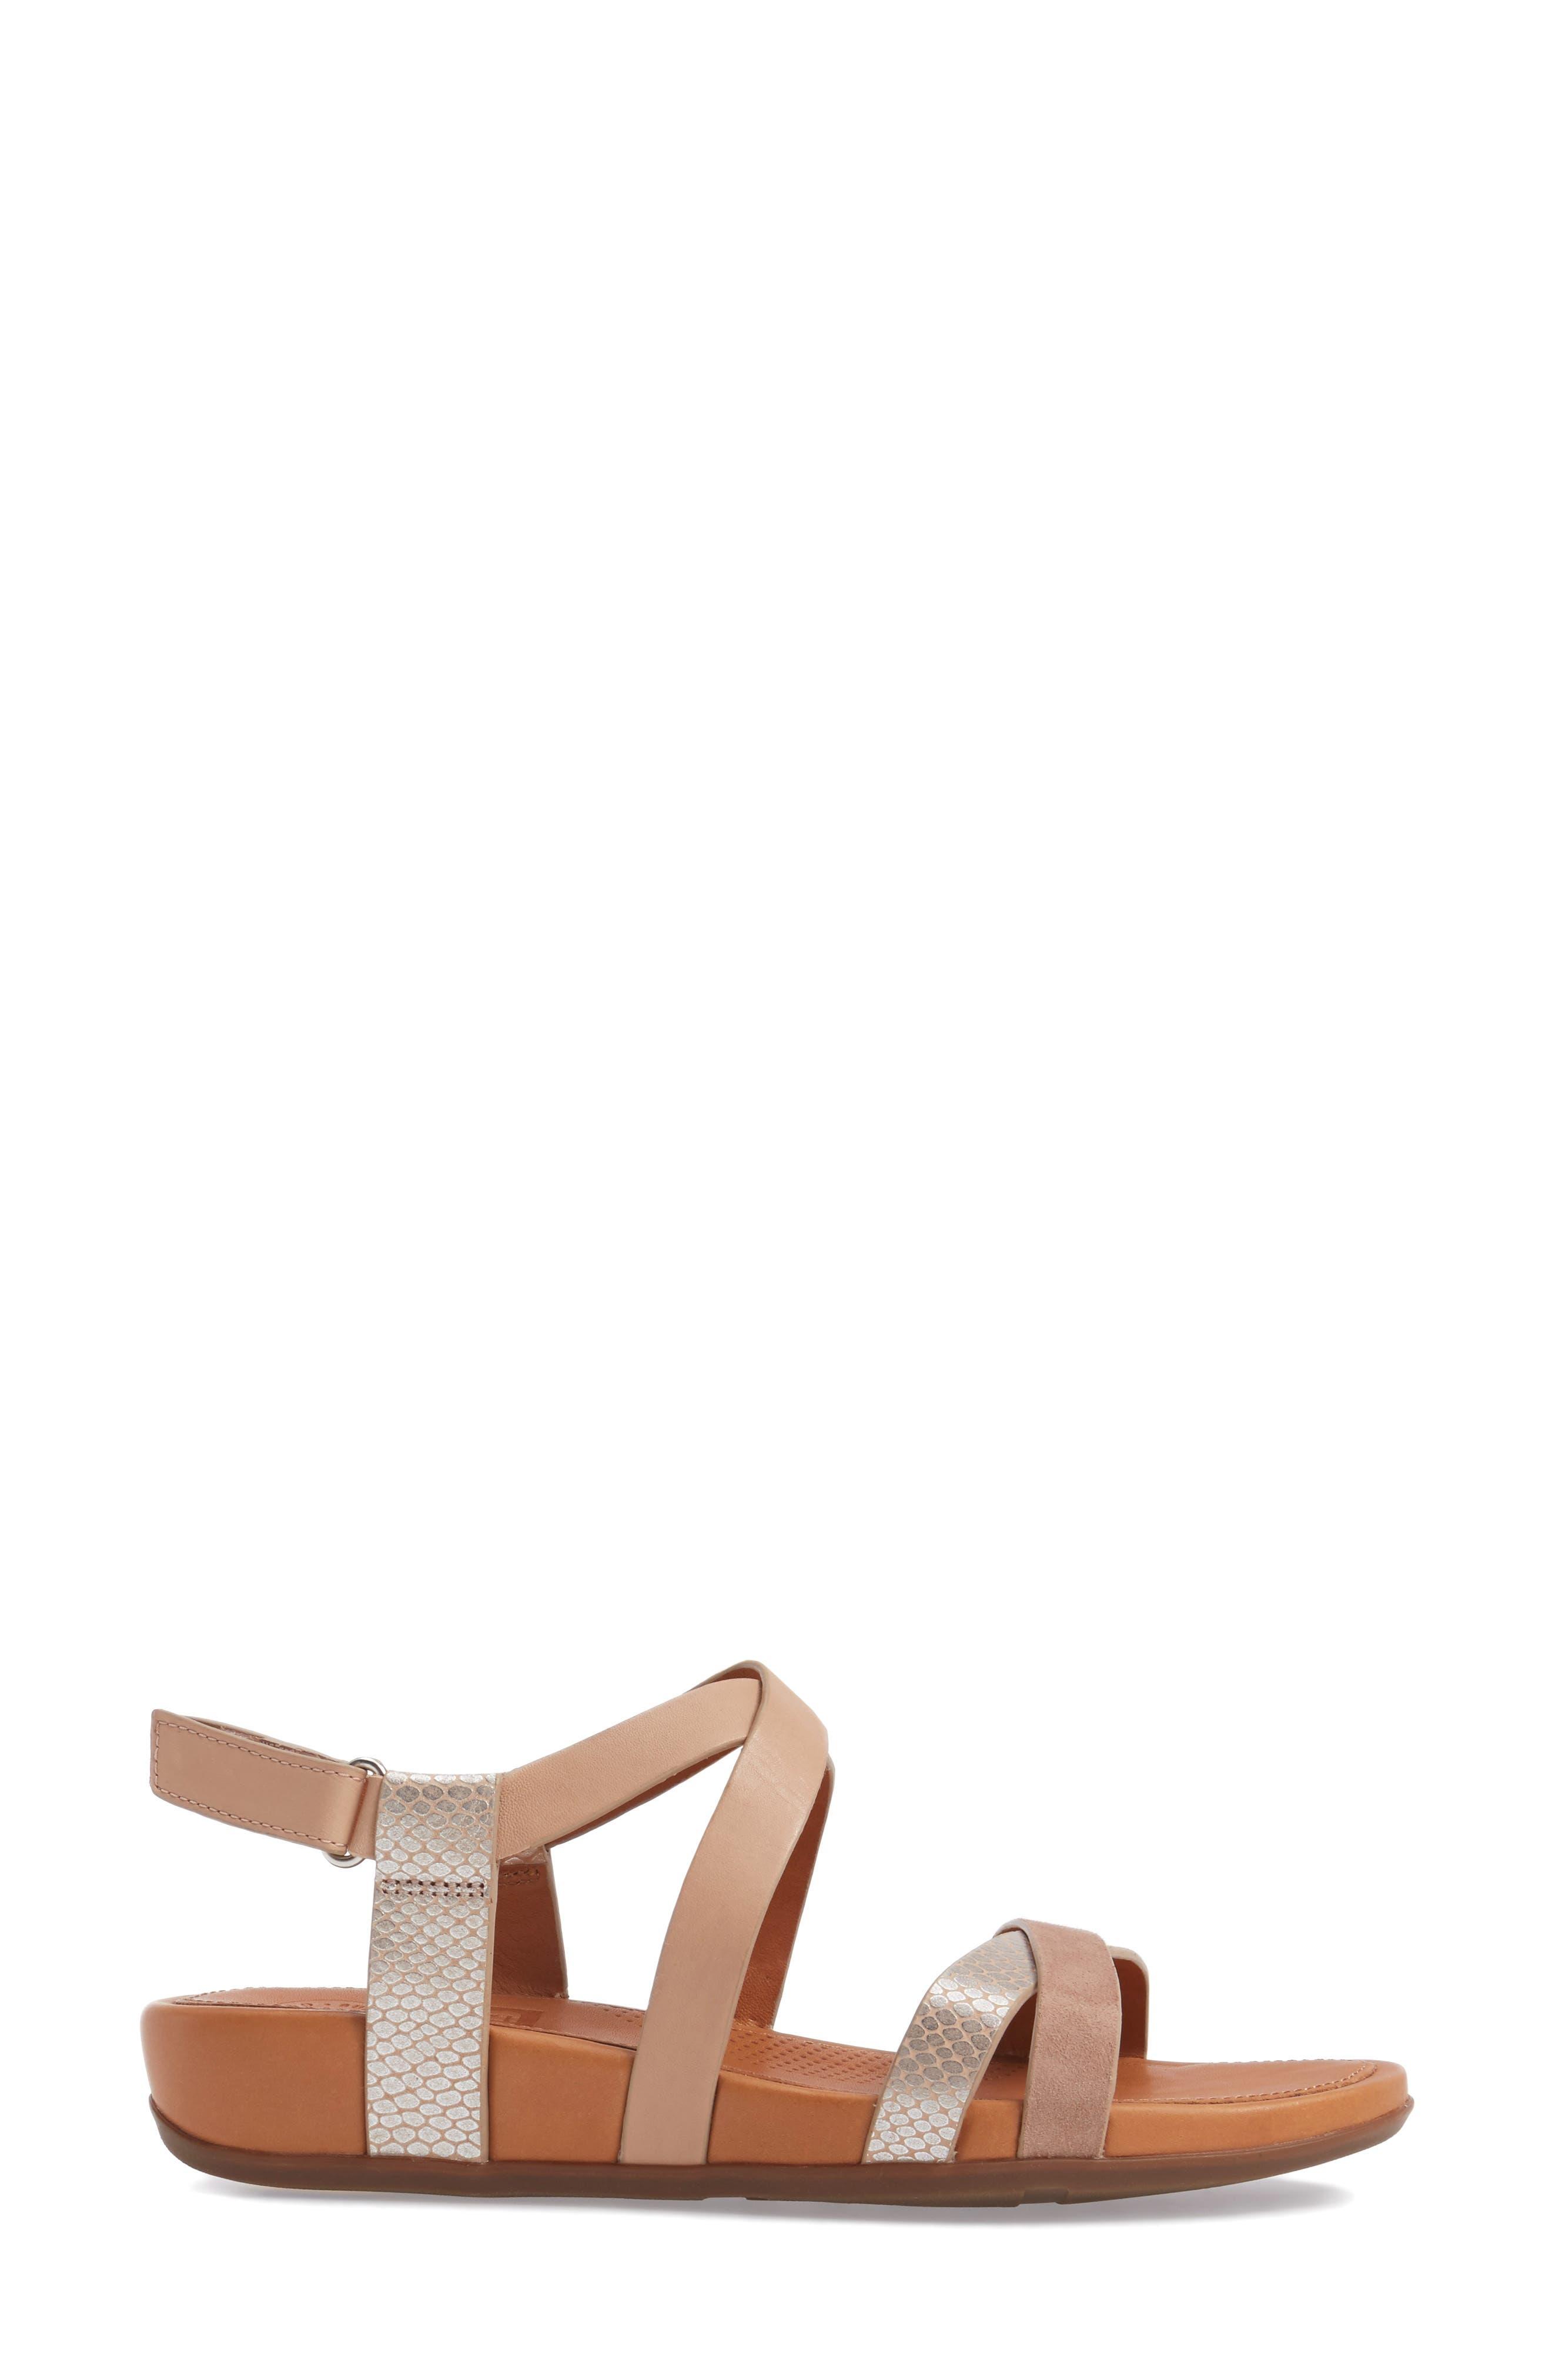 Alternate Image 3  - FitFlop Lumy Crisscross Sandal (Women)